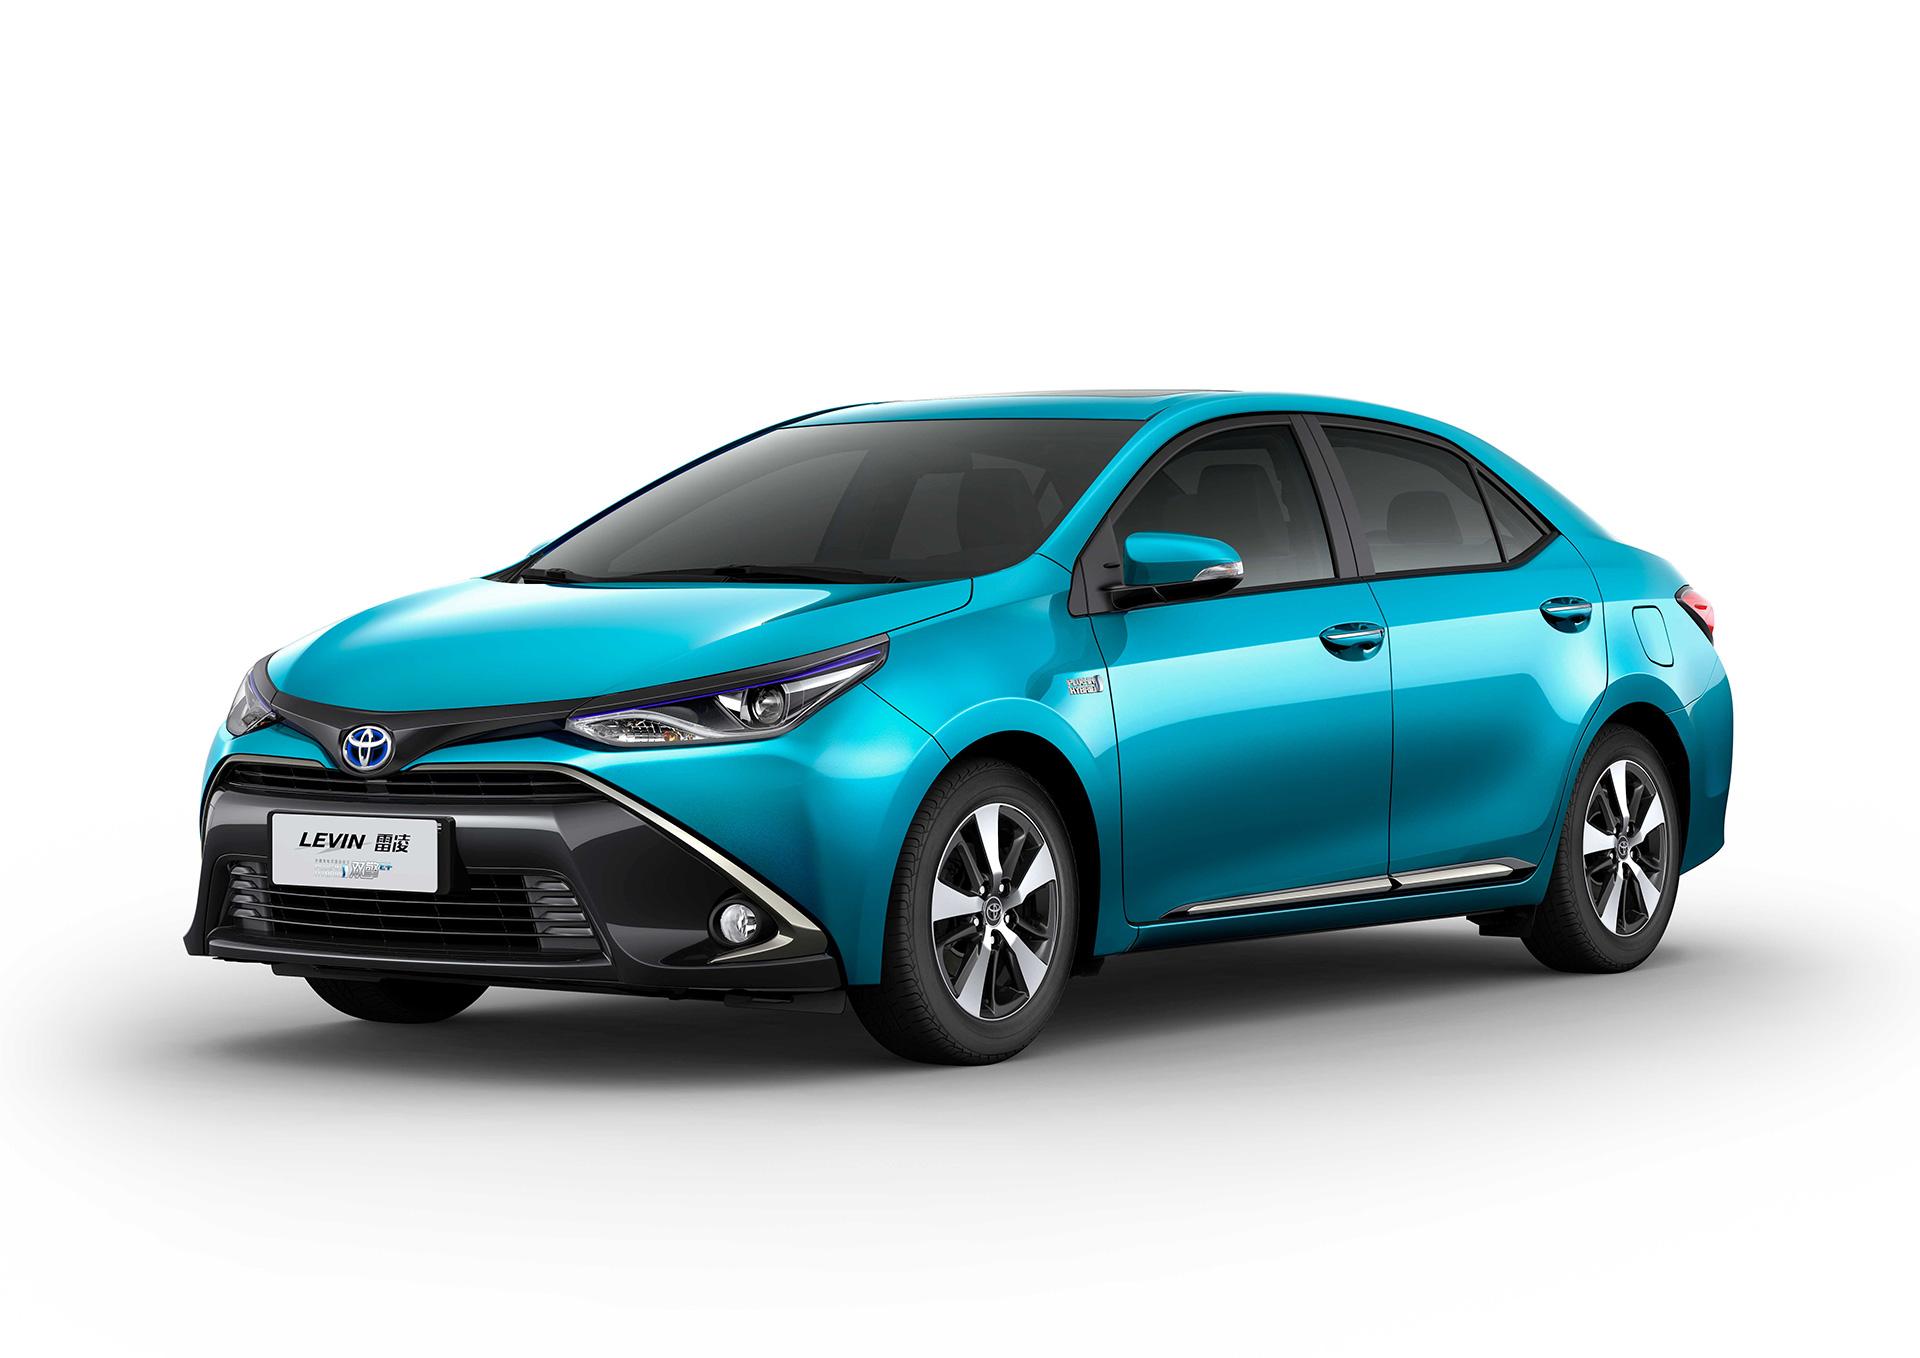 toyotas news toyota c show hr motor in geneva trim revealed production h